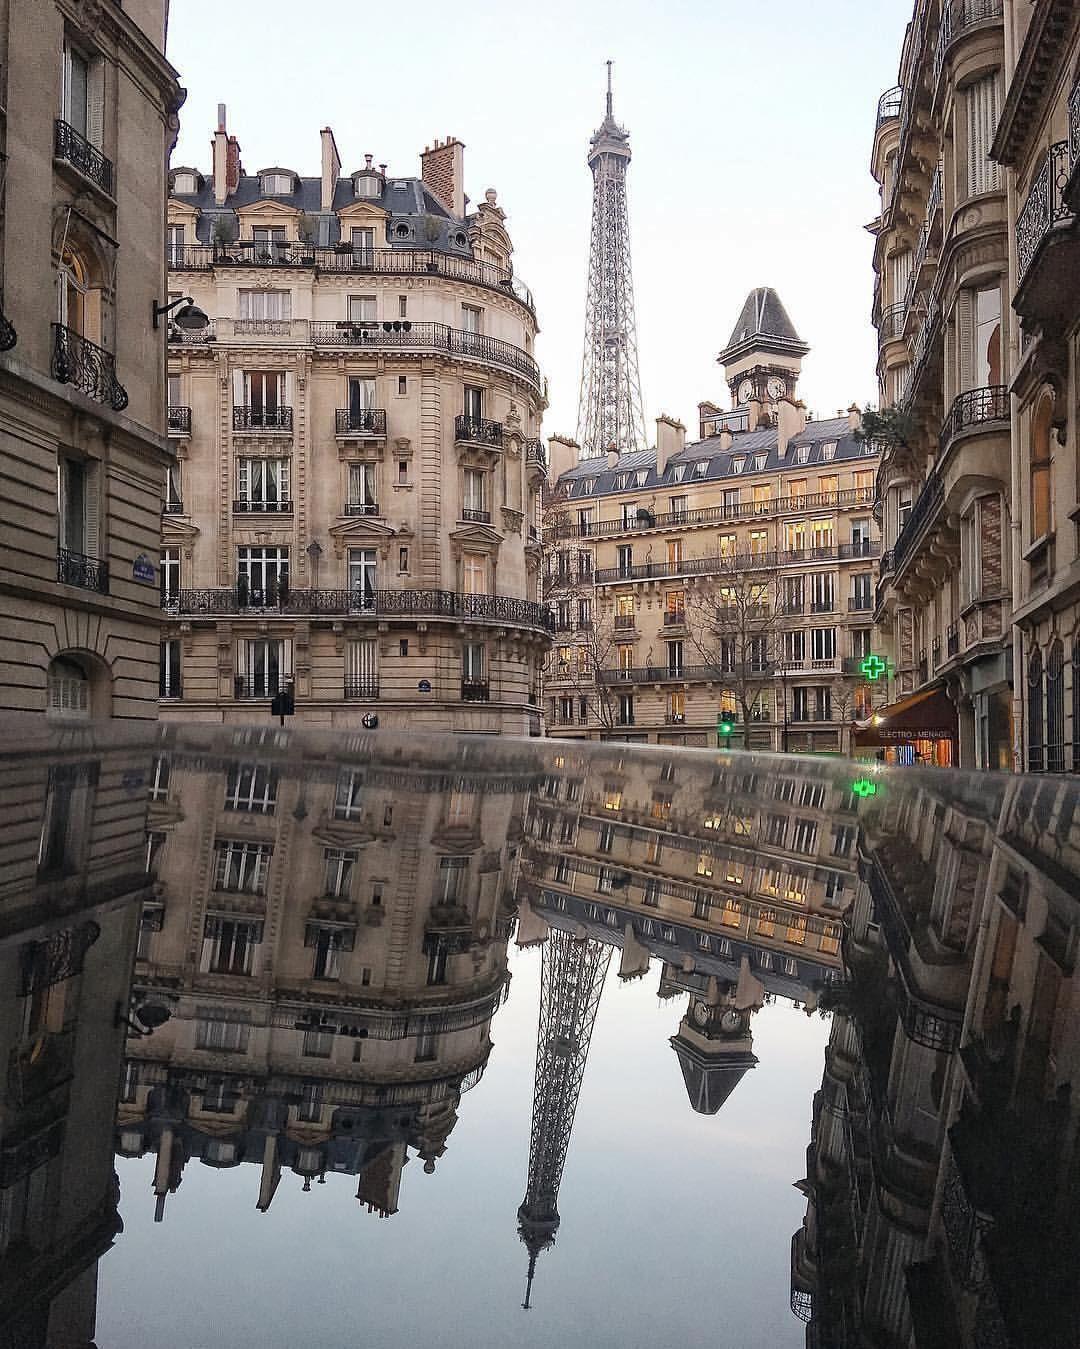 See this Instagram photo by @topparisphoto • 12.6k likes  #paris #france #topparisphoto #eatinparis #travelawesome #beautifuldestinations #bestvacation #parisjetaime #weloveparis #parisian